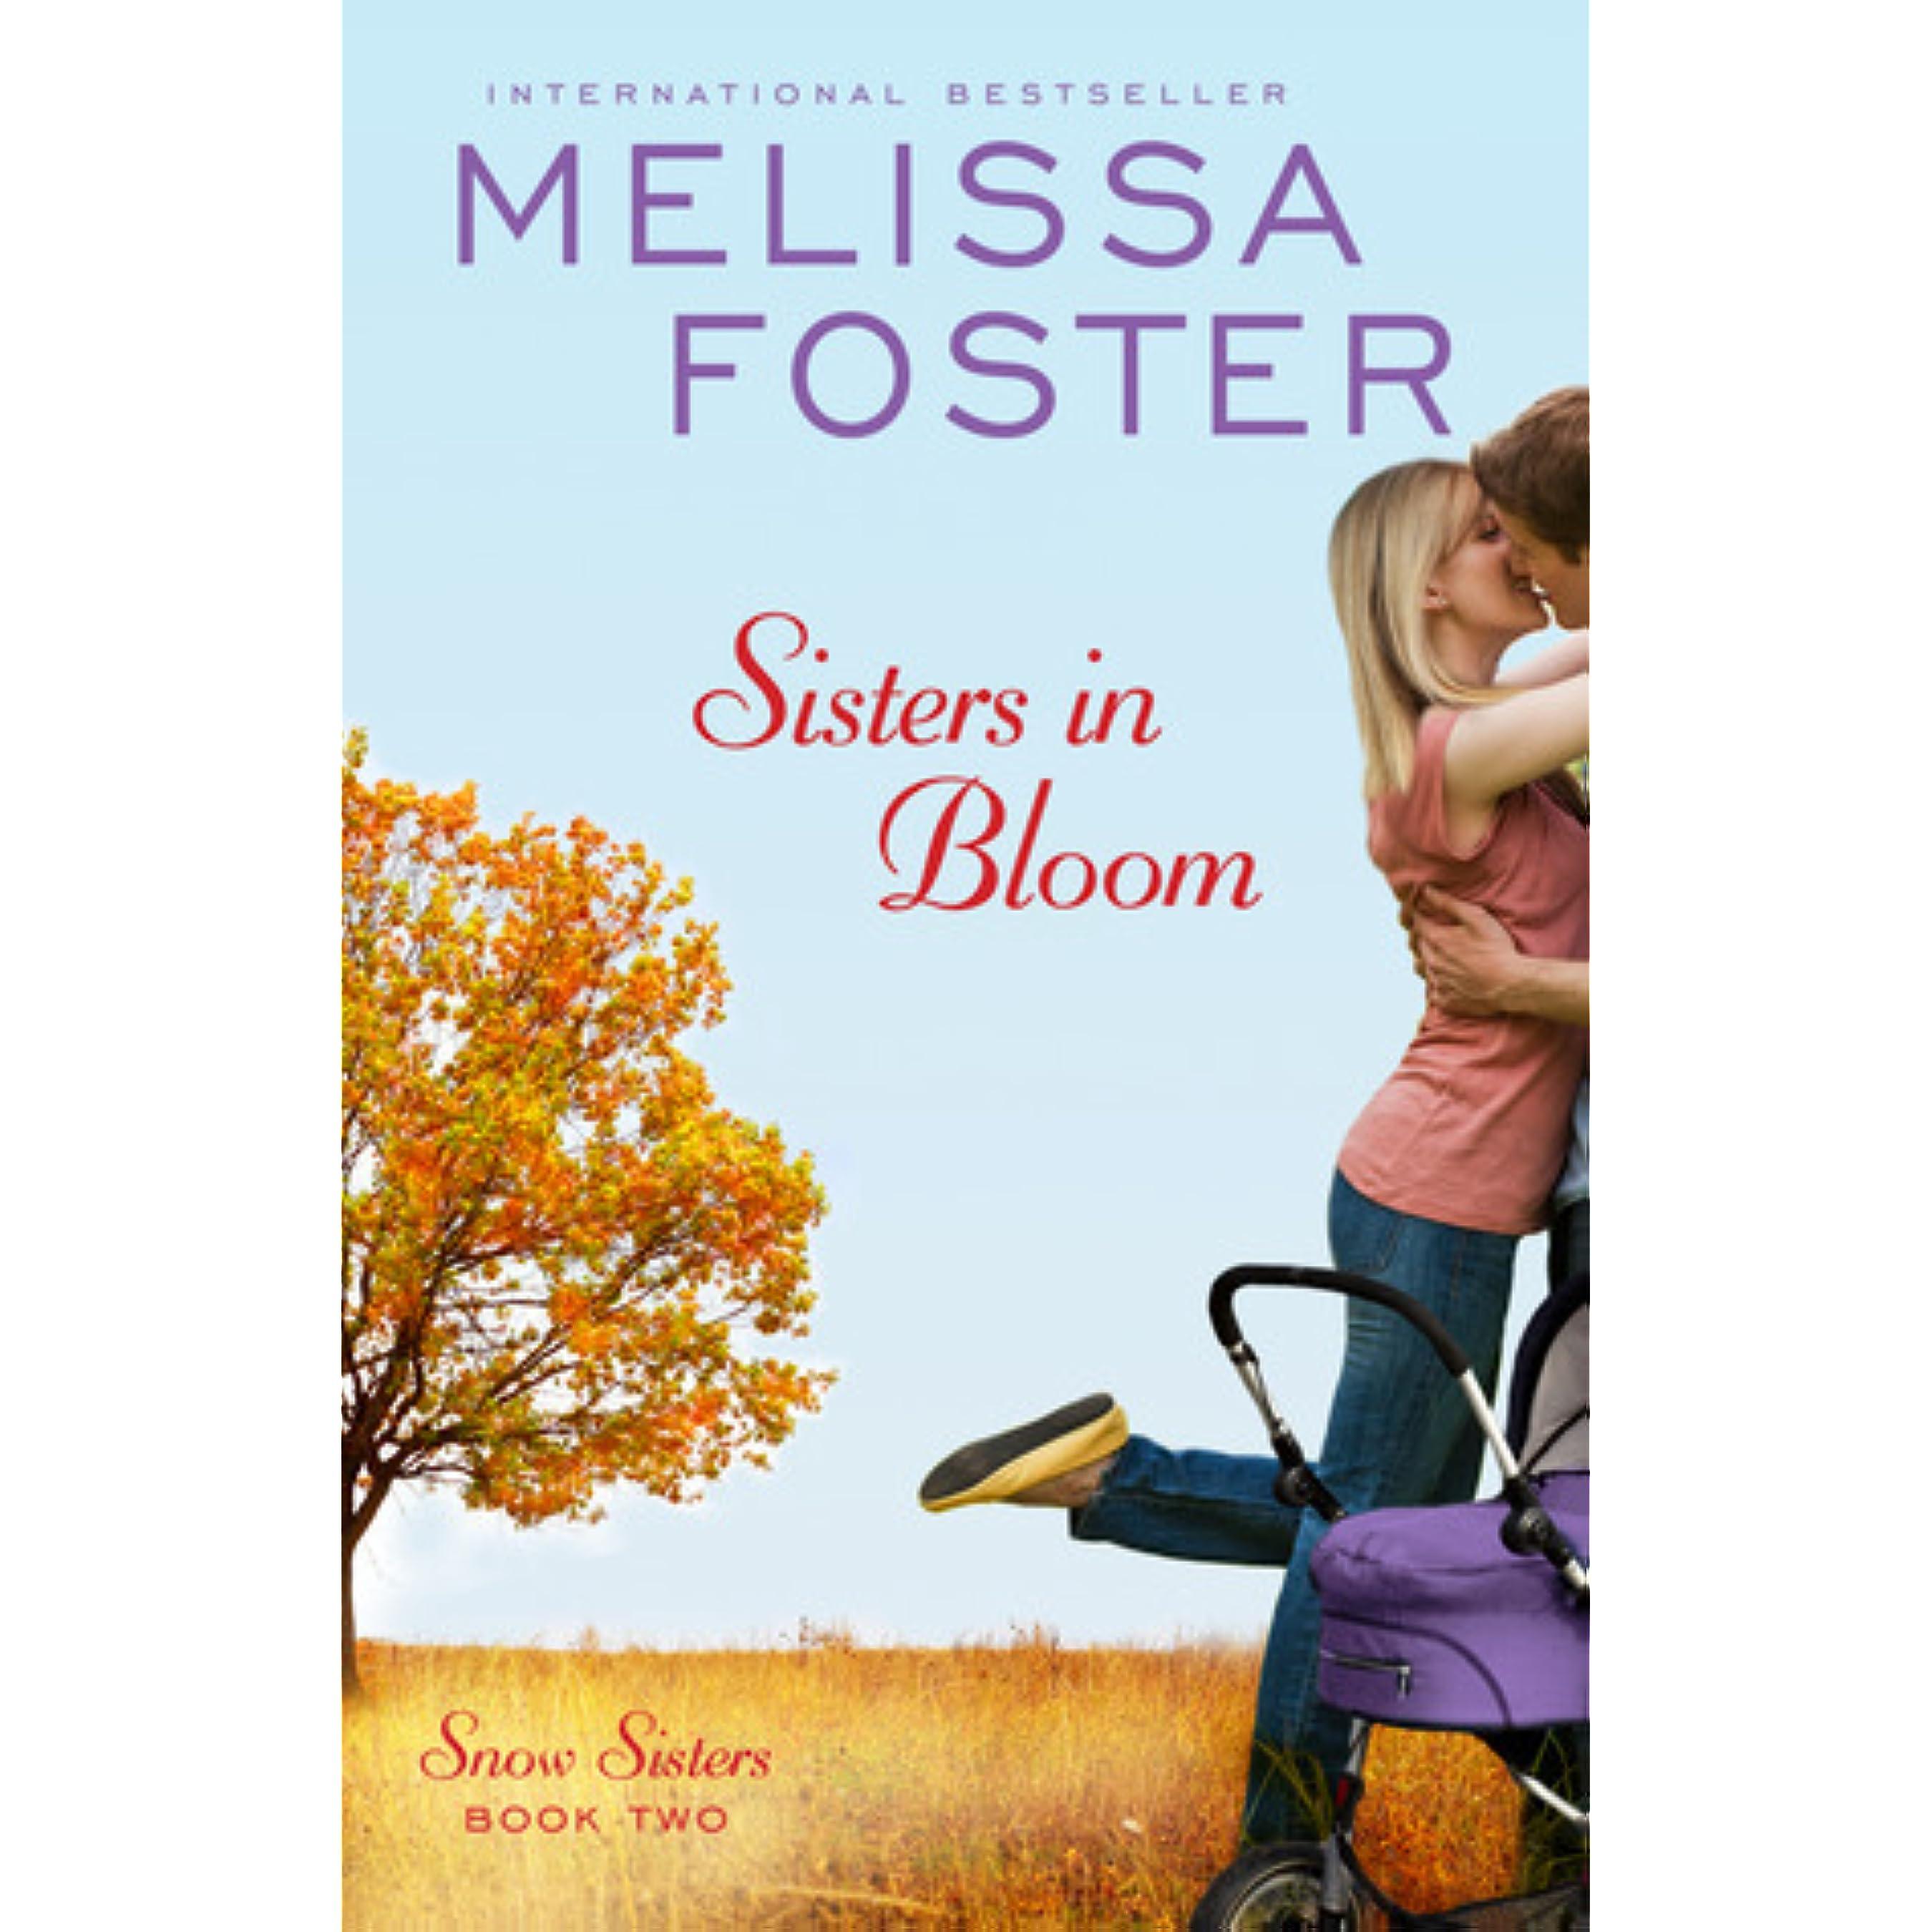 Sisters in bloom by melissa foster fandeluxe Epub